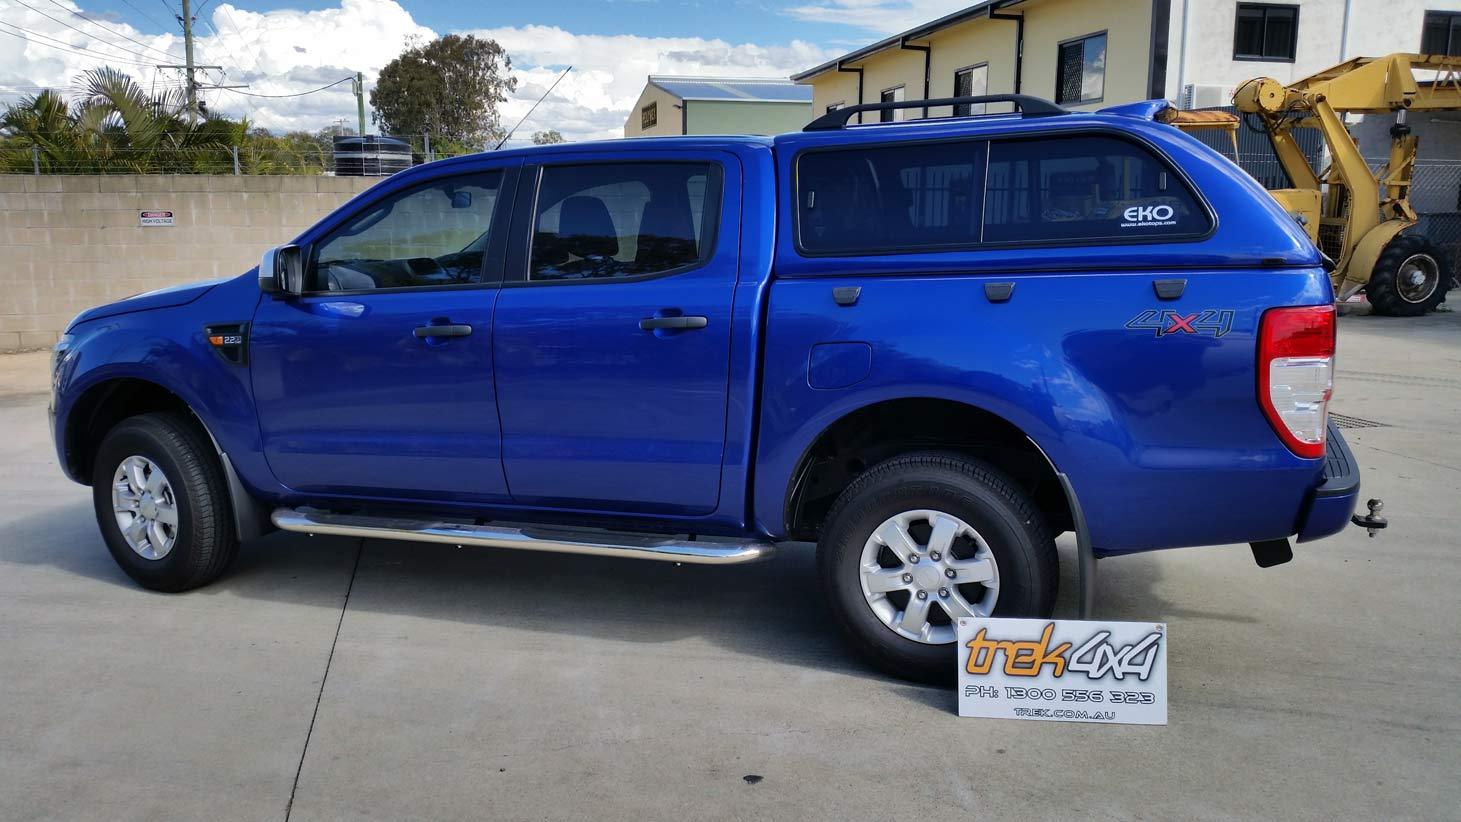 Ford Ranger Canopy Picture ShopEKO